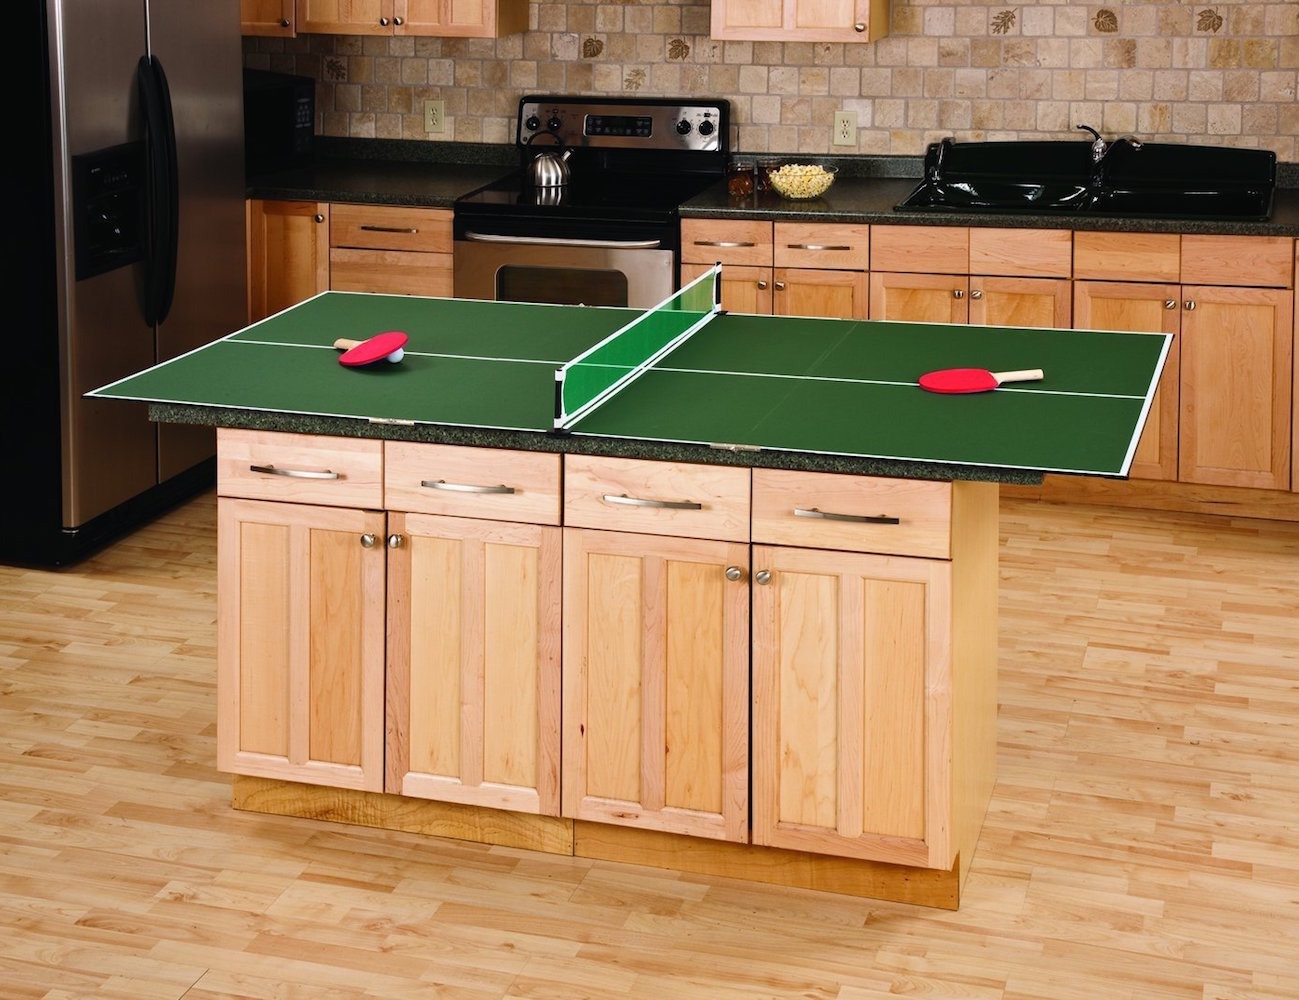 Kitchen Table Tennis